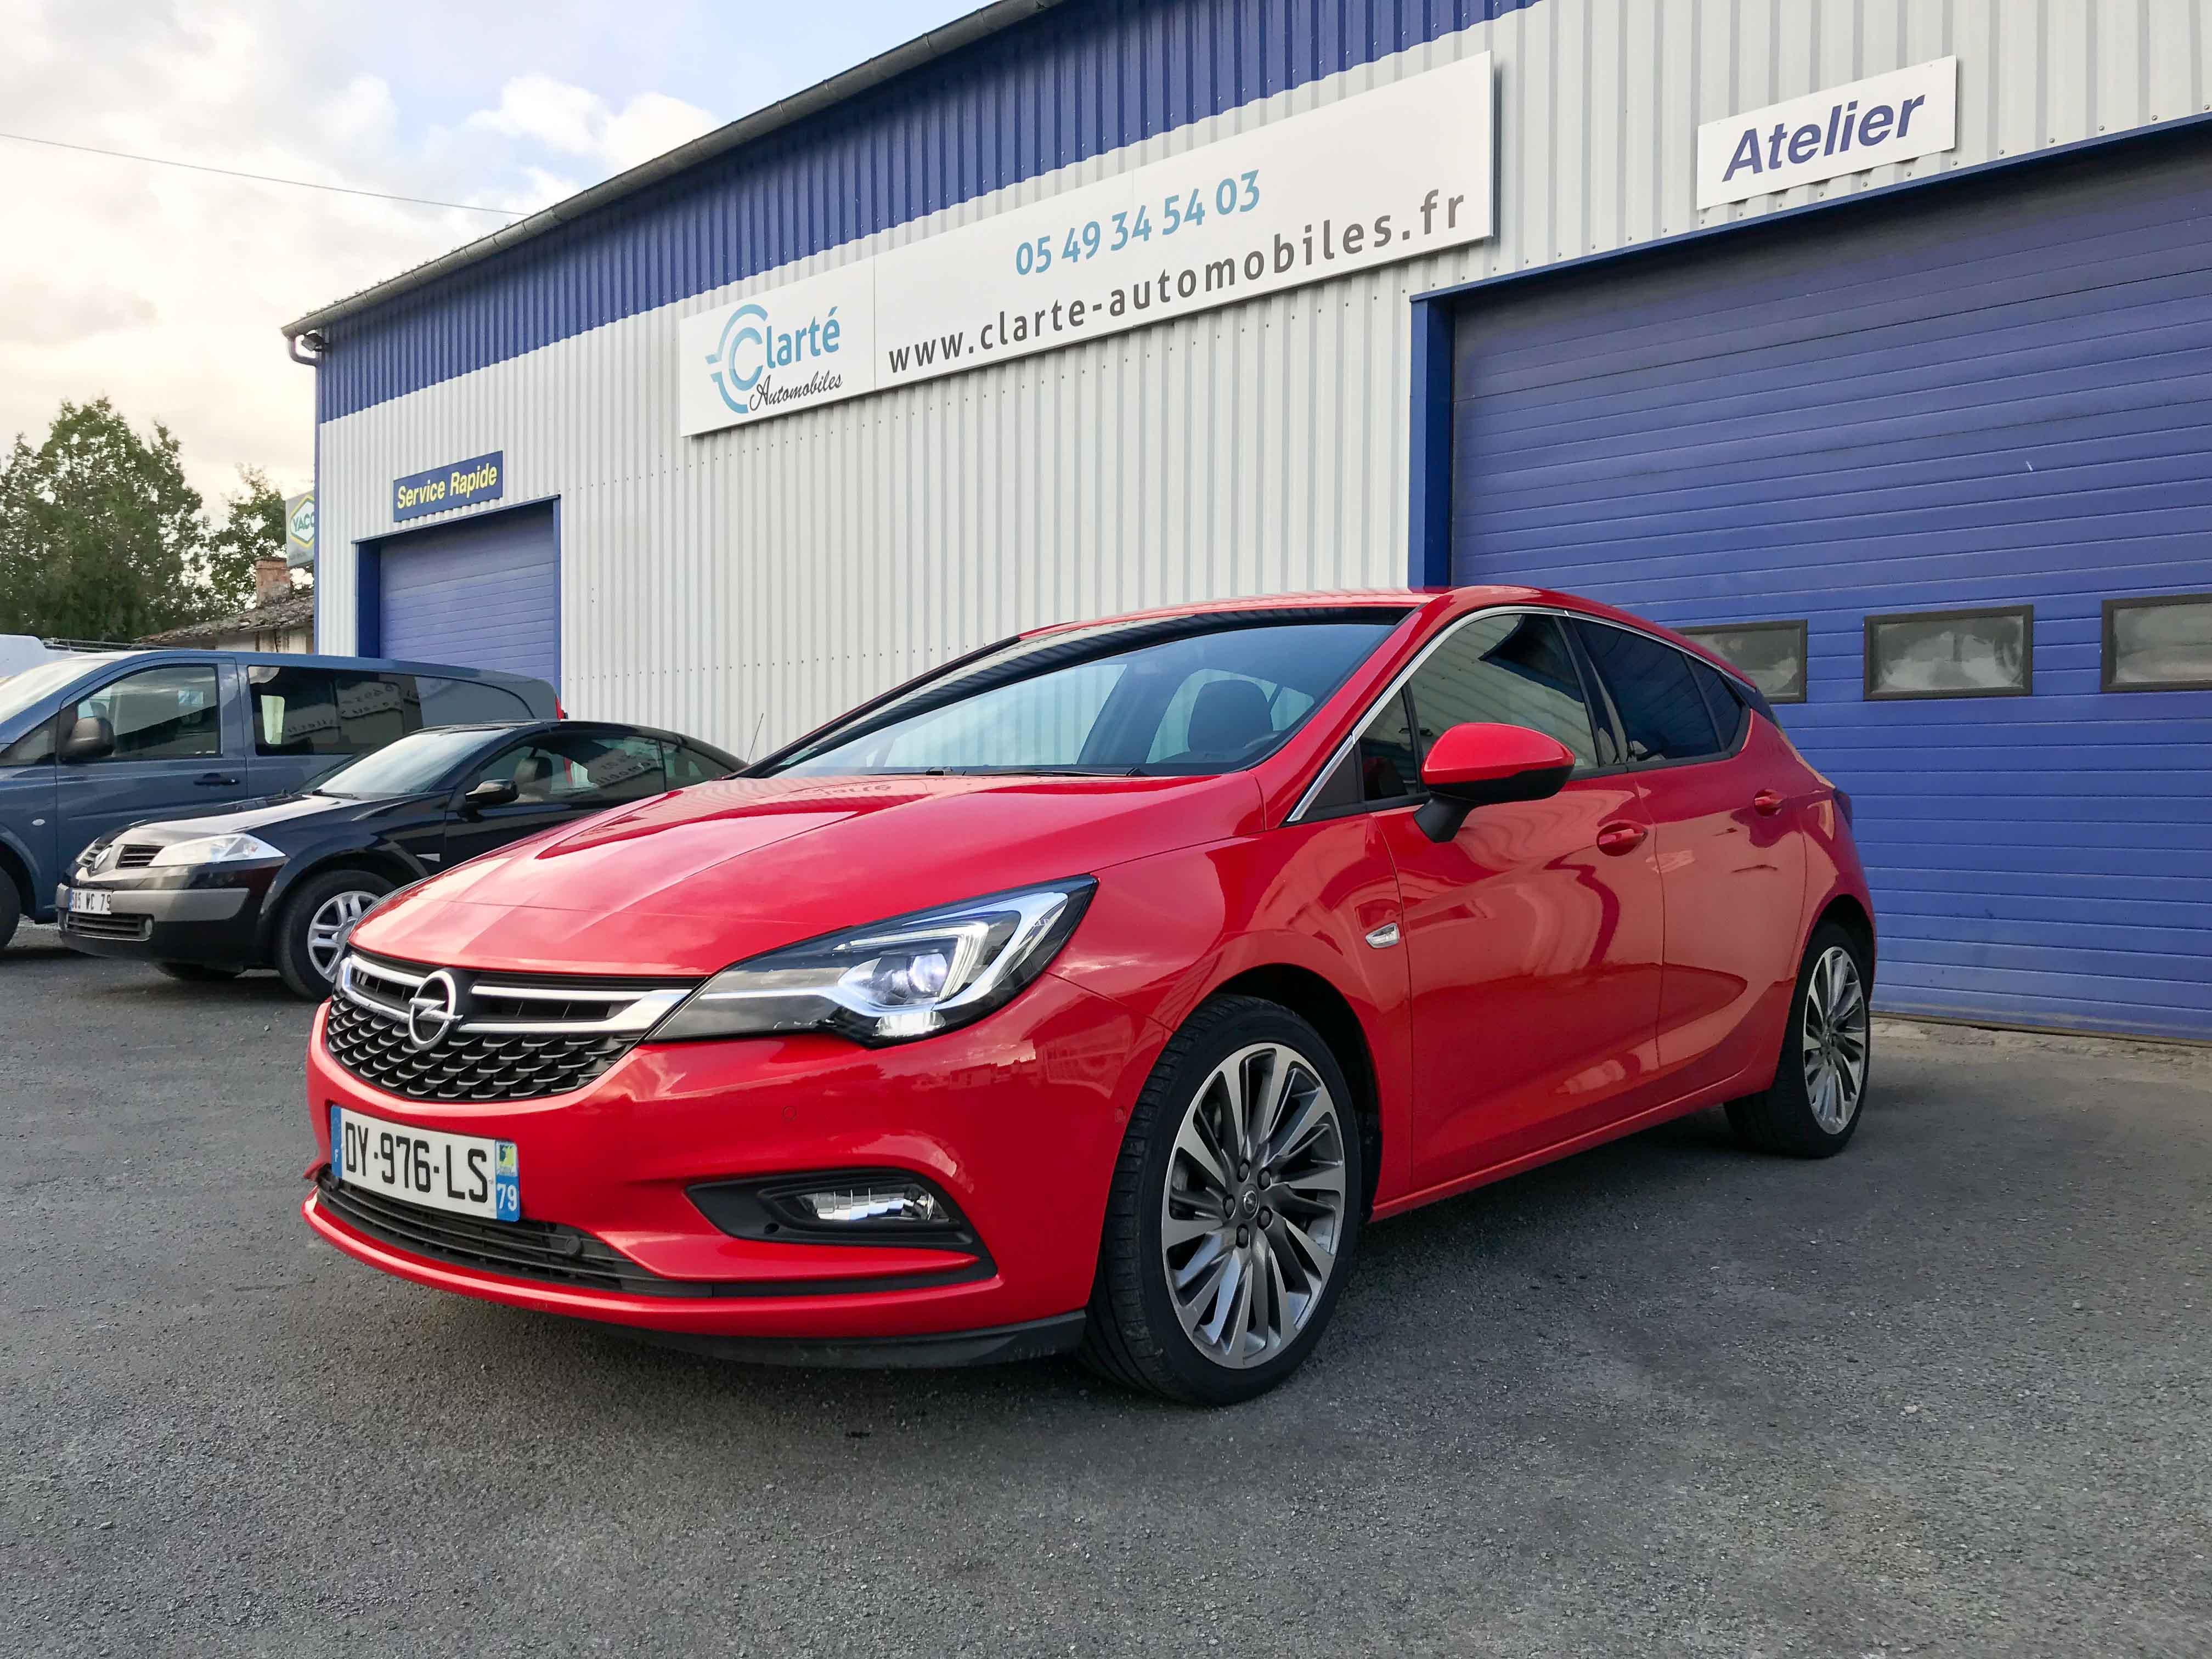 Opel astra clart automobilesclart automobiles for Garage opel niort